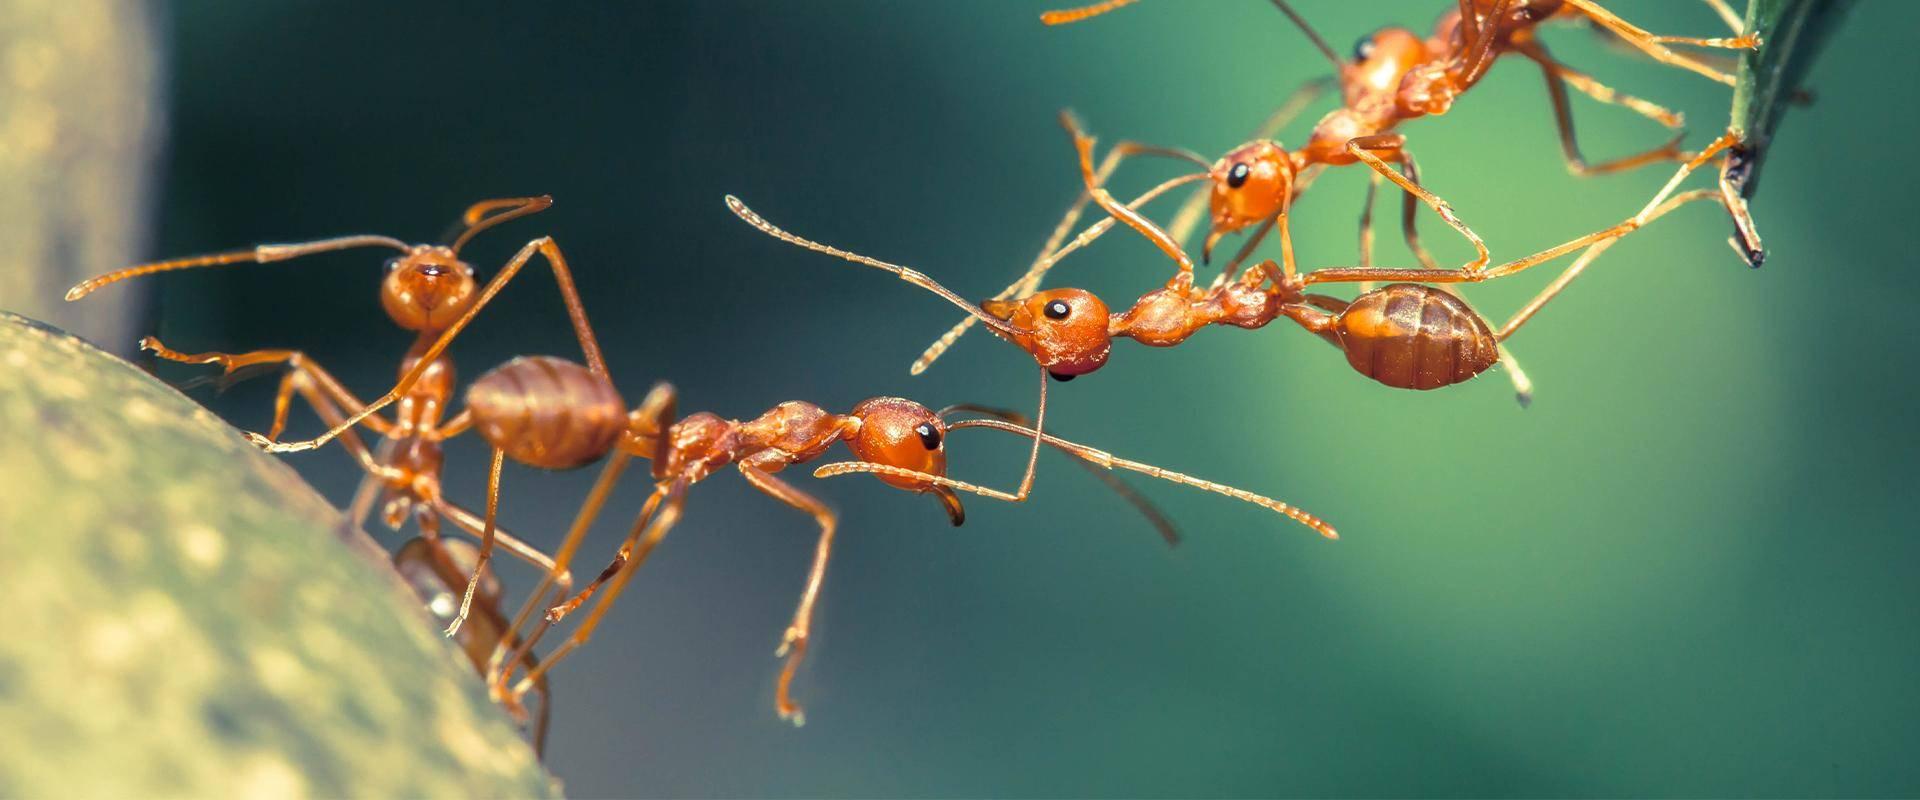 a fire ant bridge